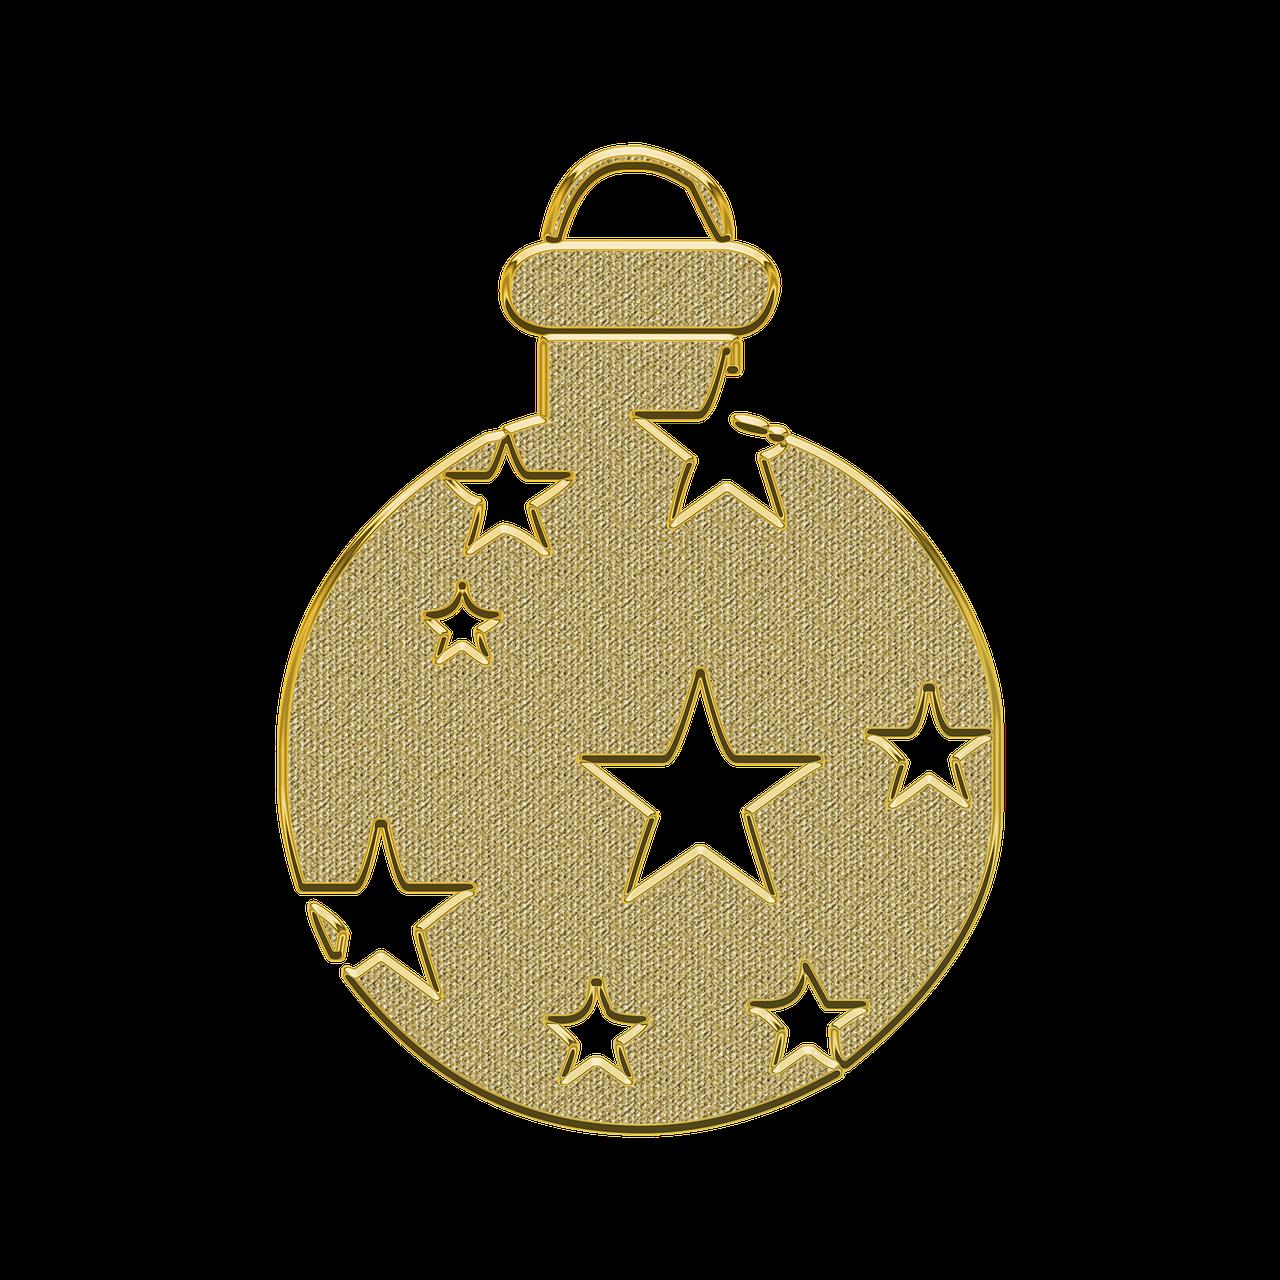 Vacation, Ornament, Decor, Vector, Gold, Golden vacation